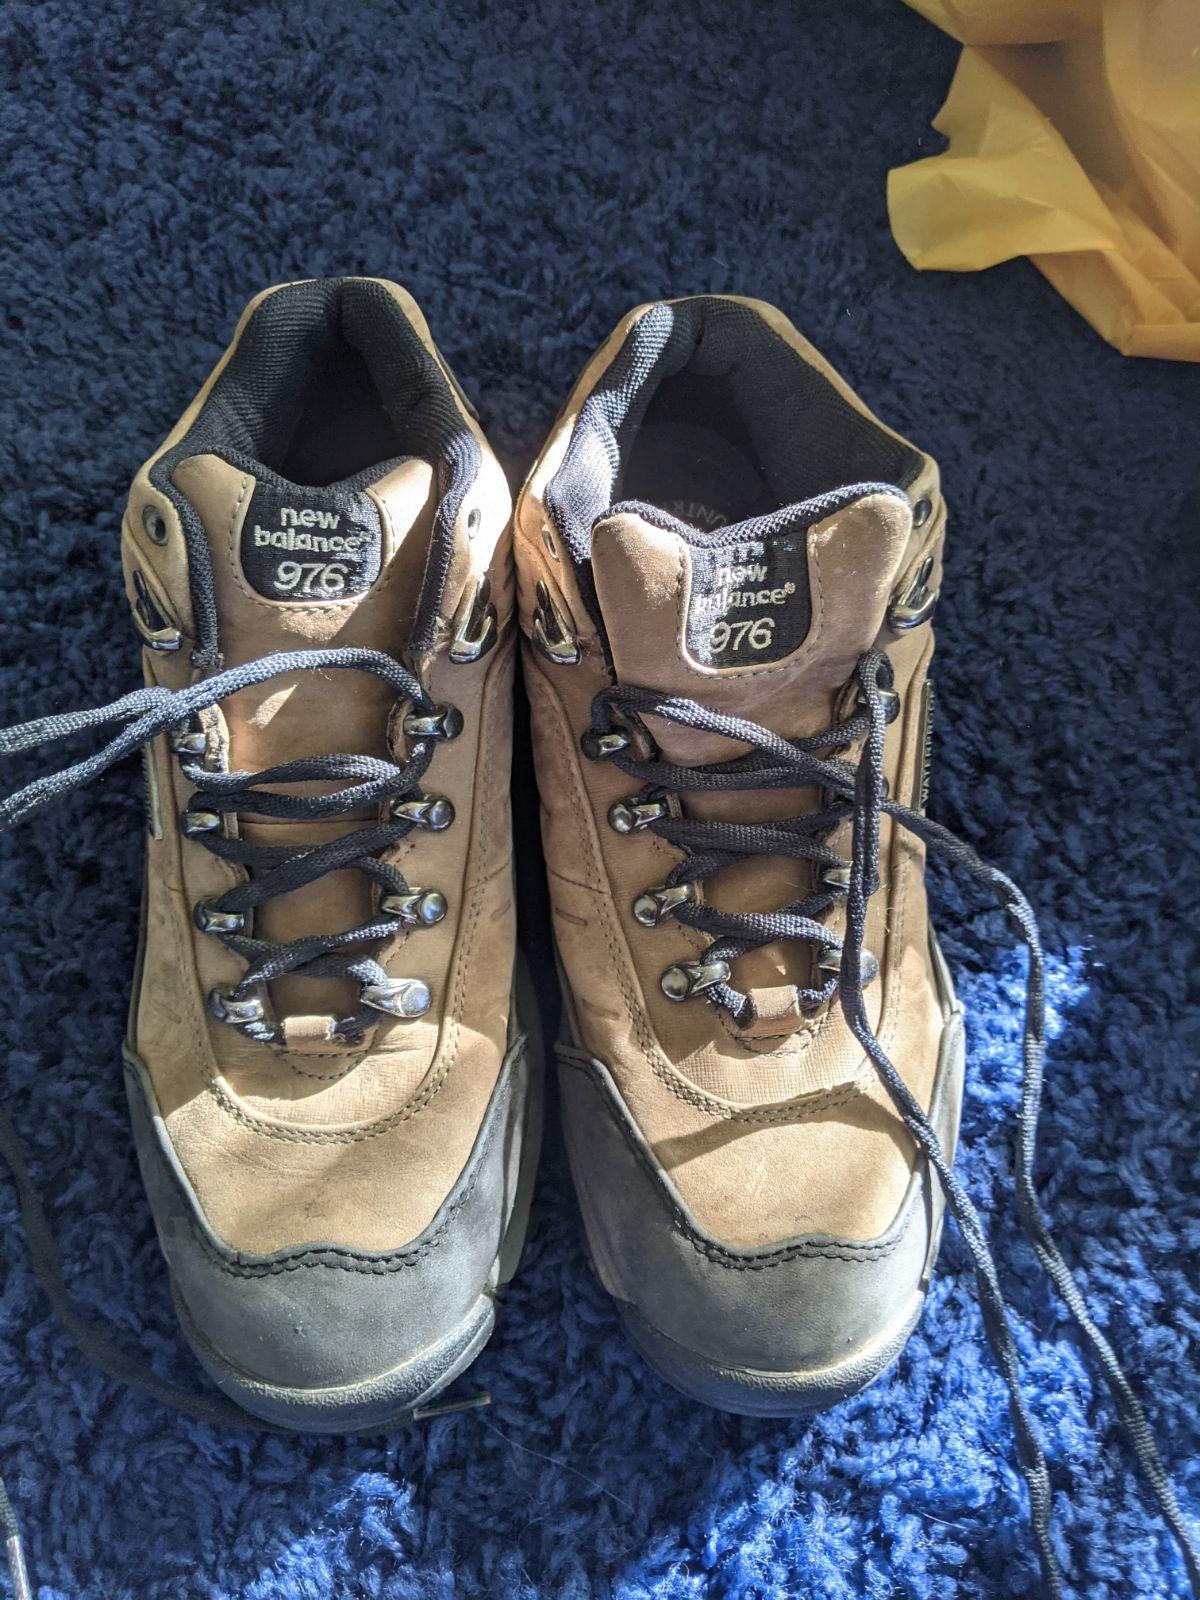 New Balance 976 Hiking Boots